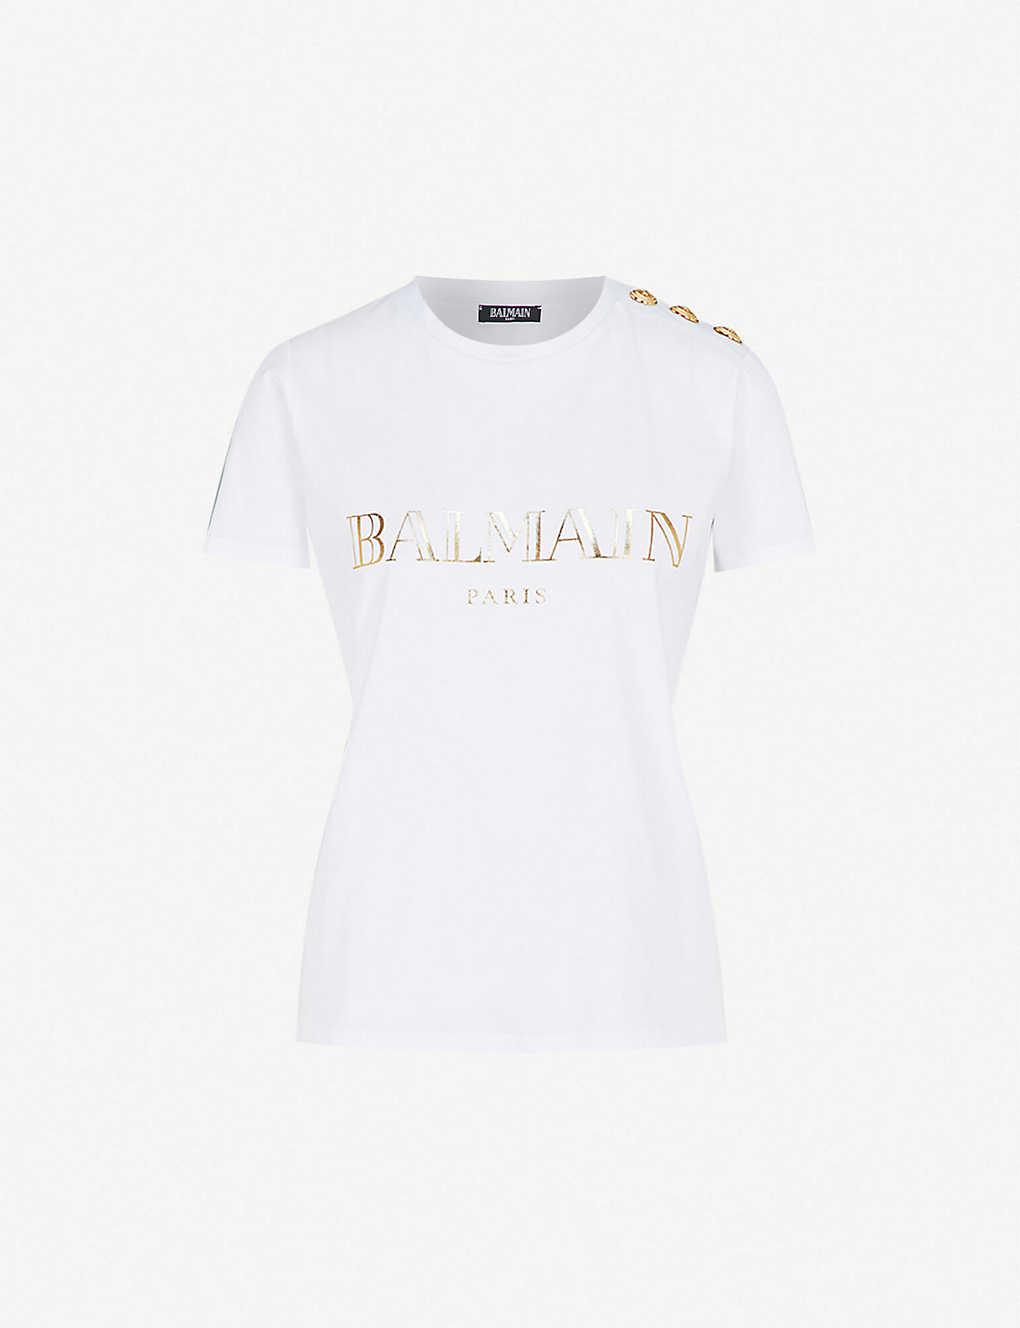 f65800be0 BALMAIN - Metallic logo-print cotton-jersey T-shirt | Selfridges.com